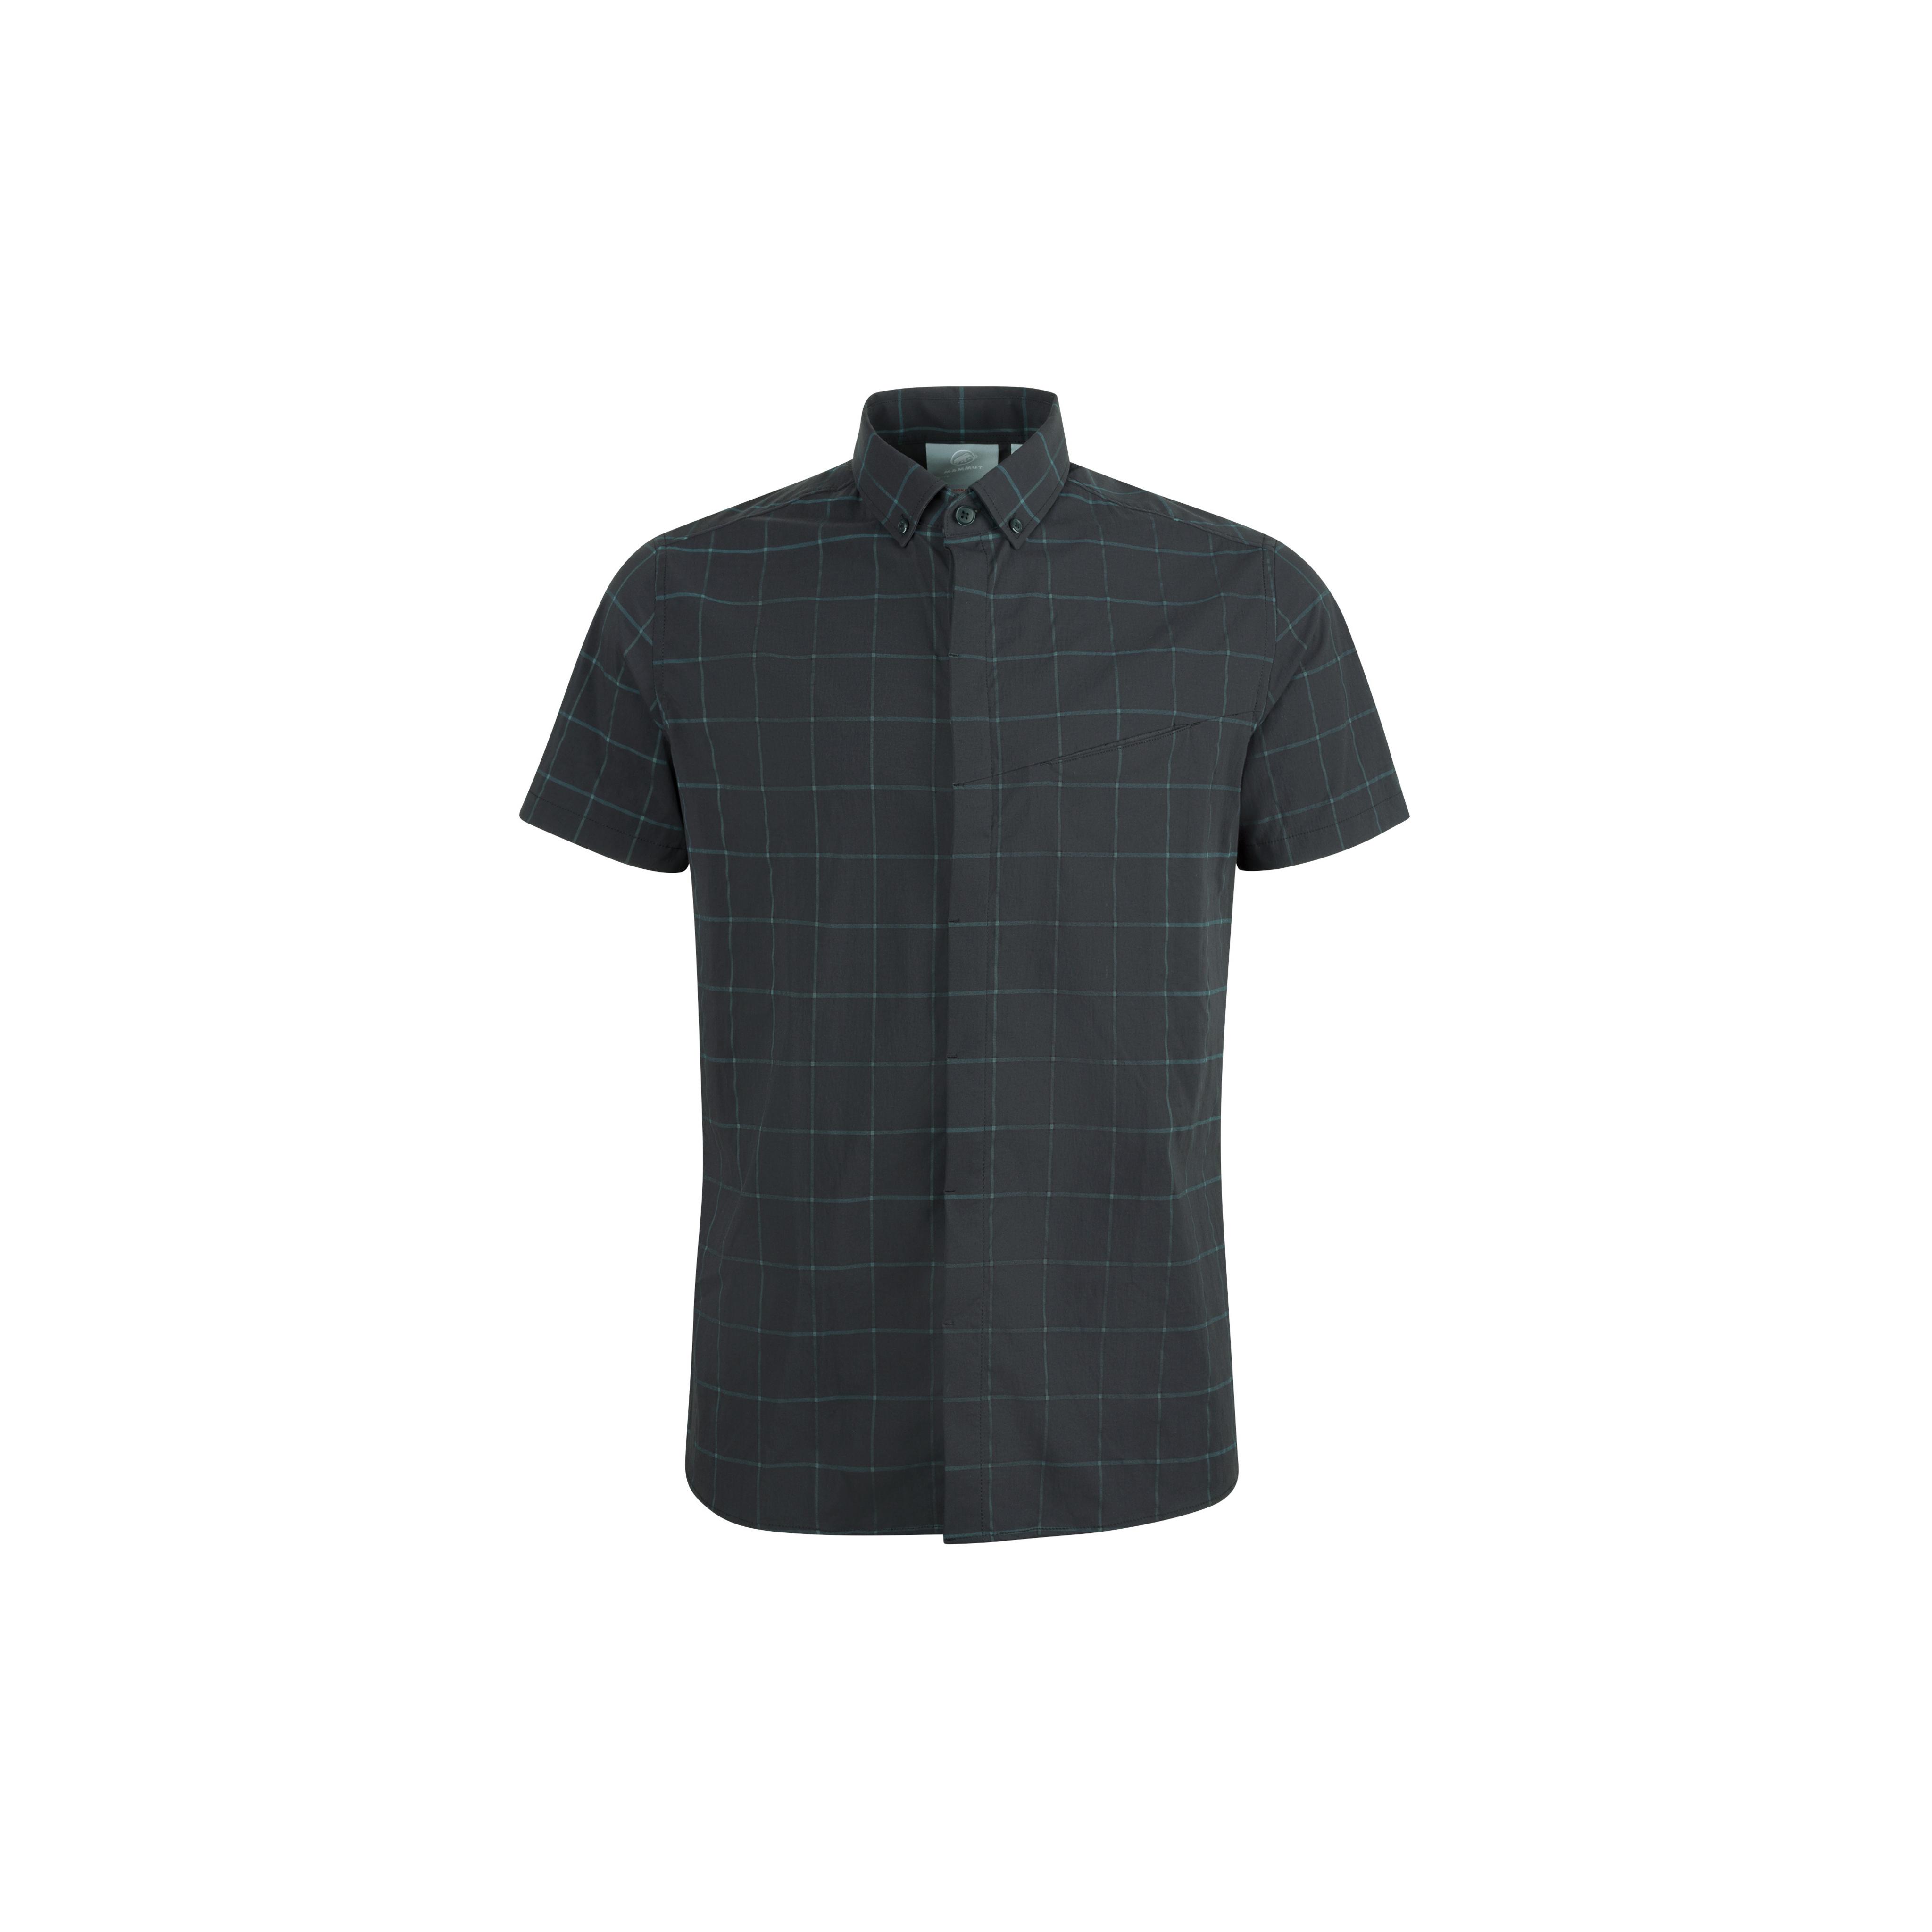 Mountain Shirt Men - black-dark ocean, S thumbnail